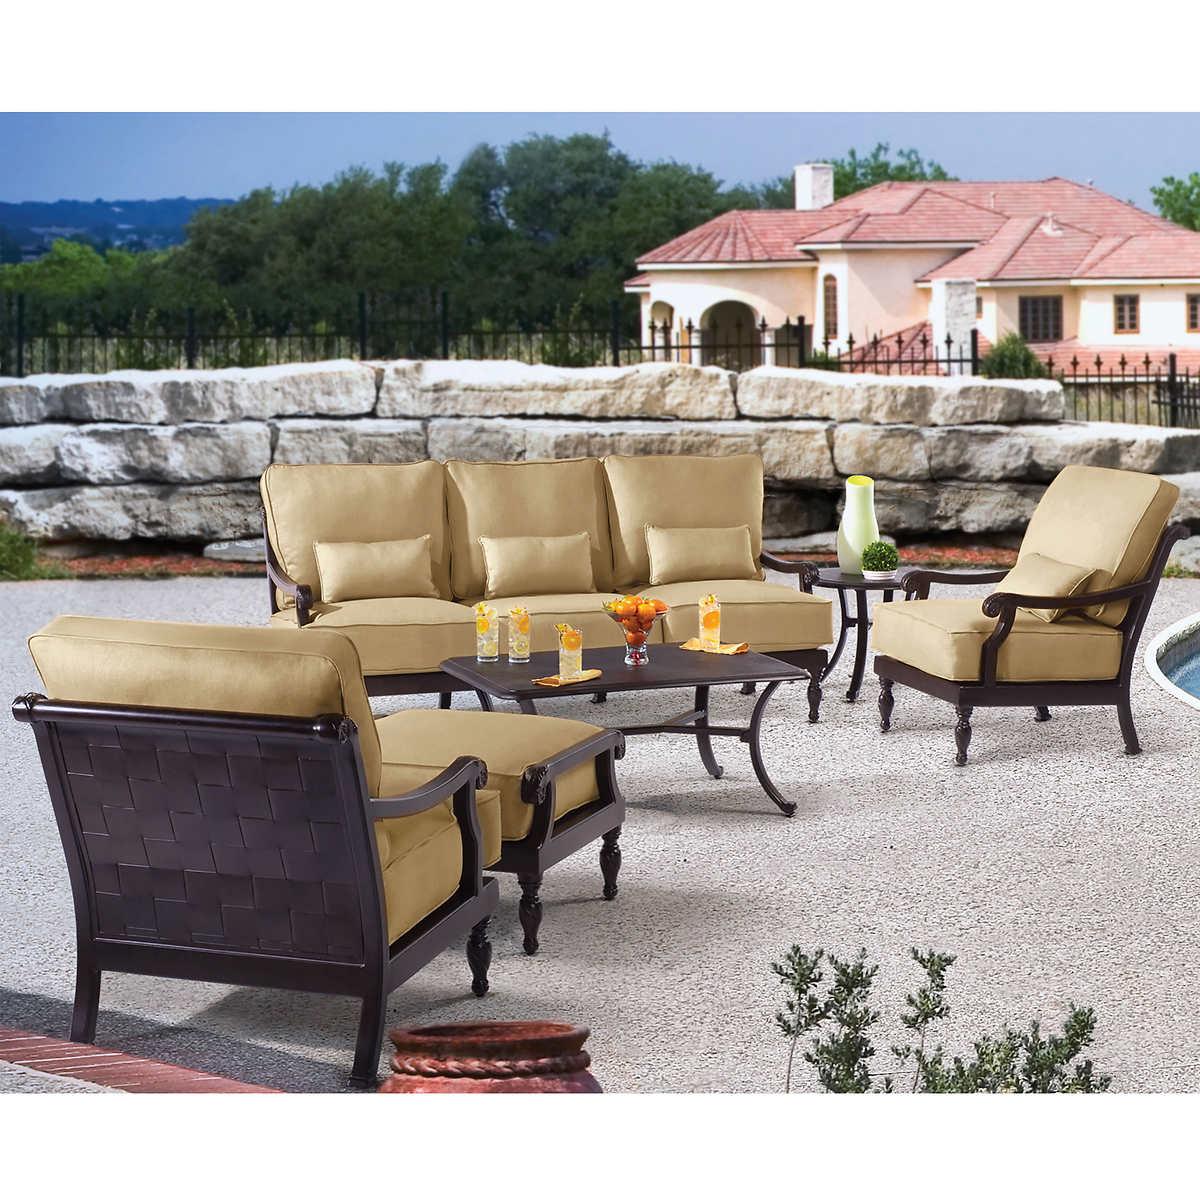 Villa 6-piece Seating Set - Seating Sets Costco